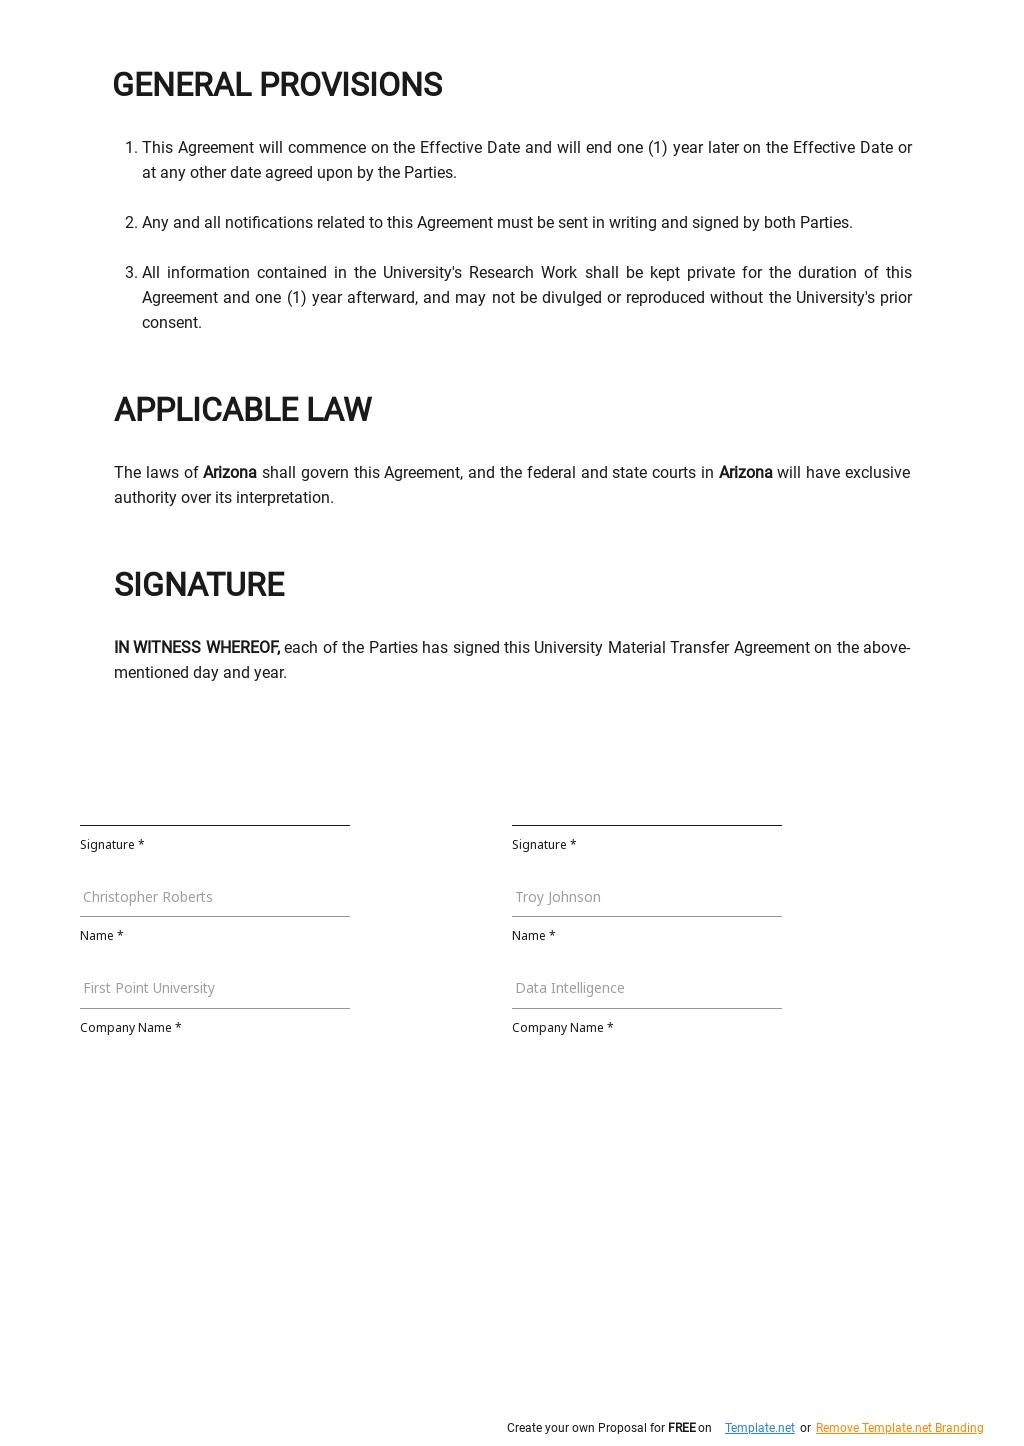 University Material Transfer Agreement Template  2.jpe